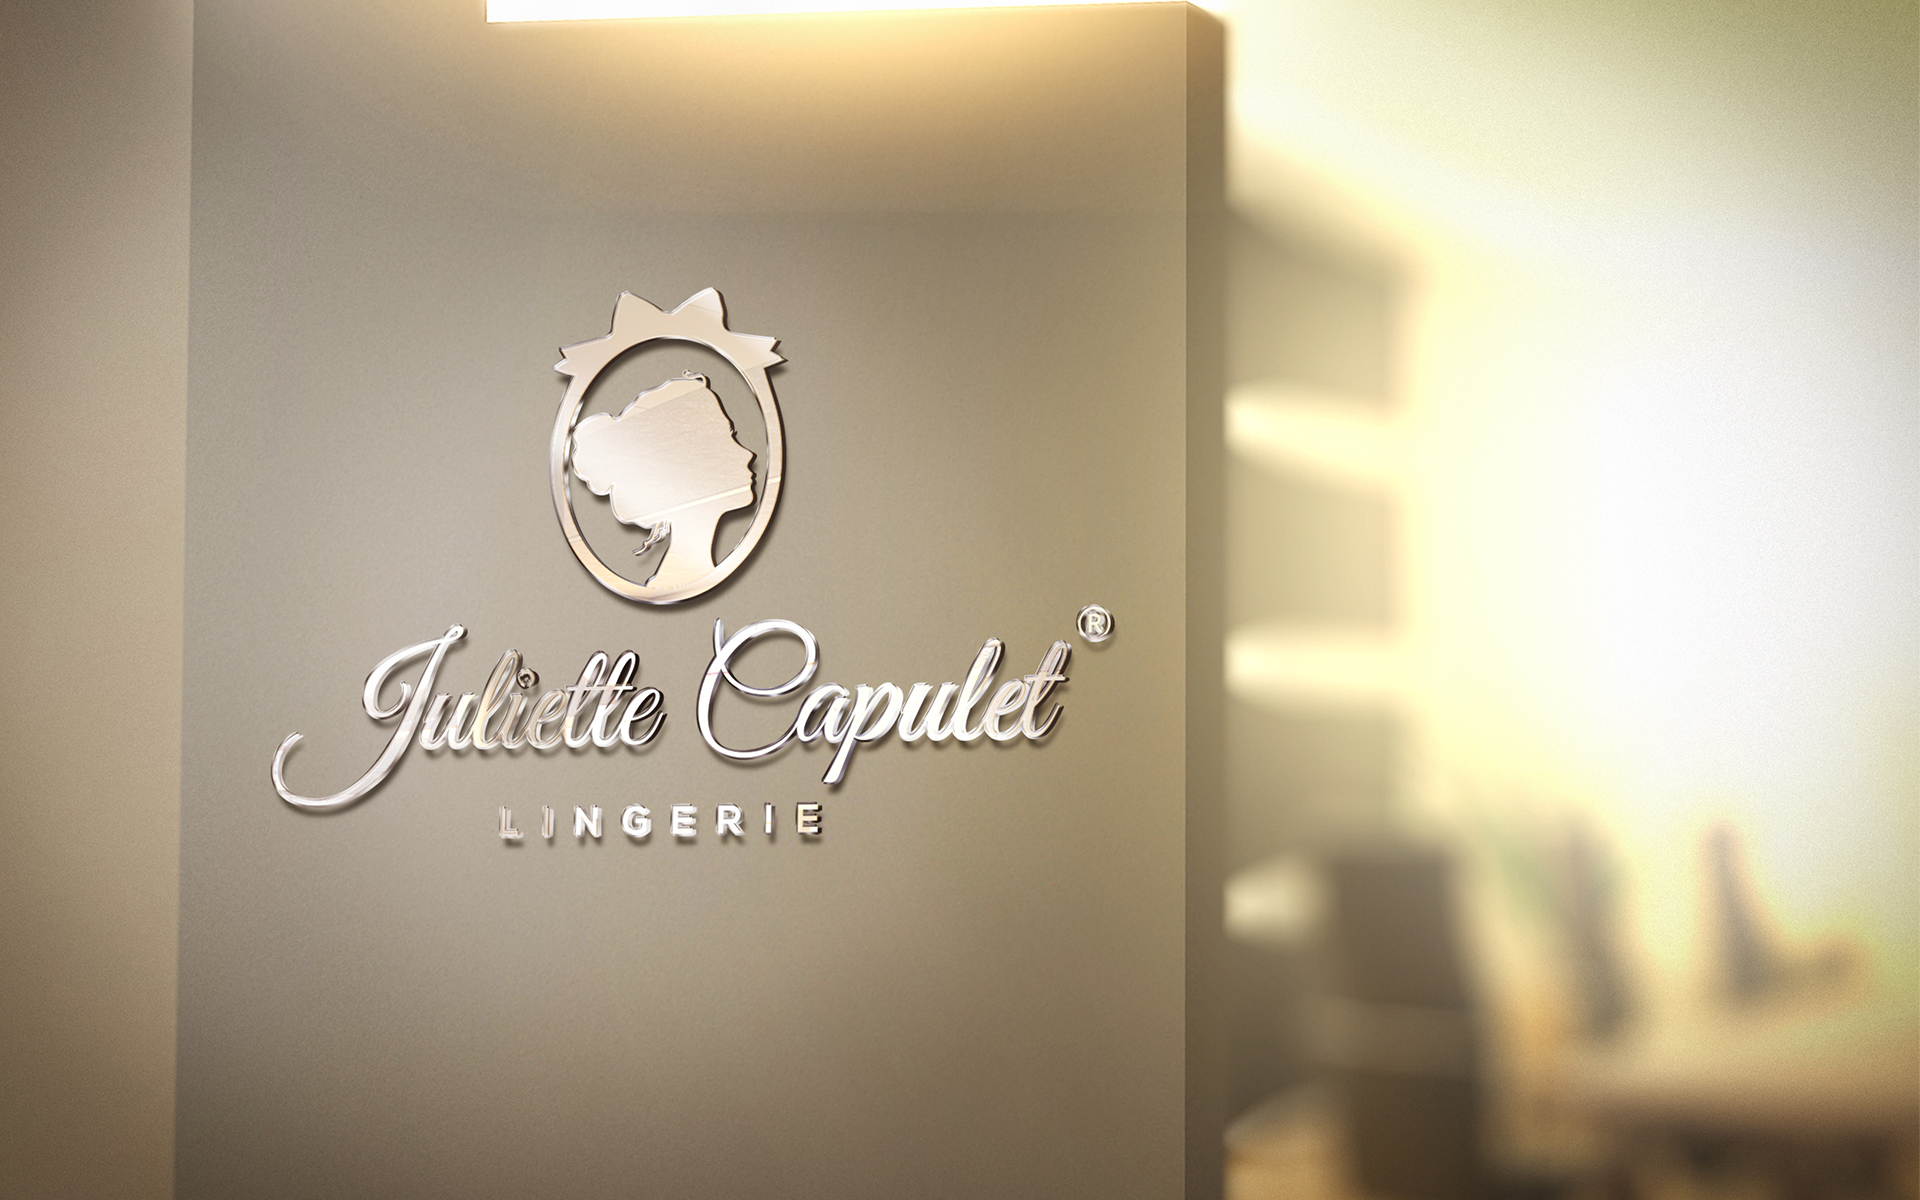 Logo Juliette Capulet